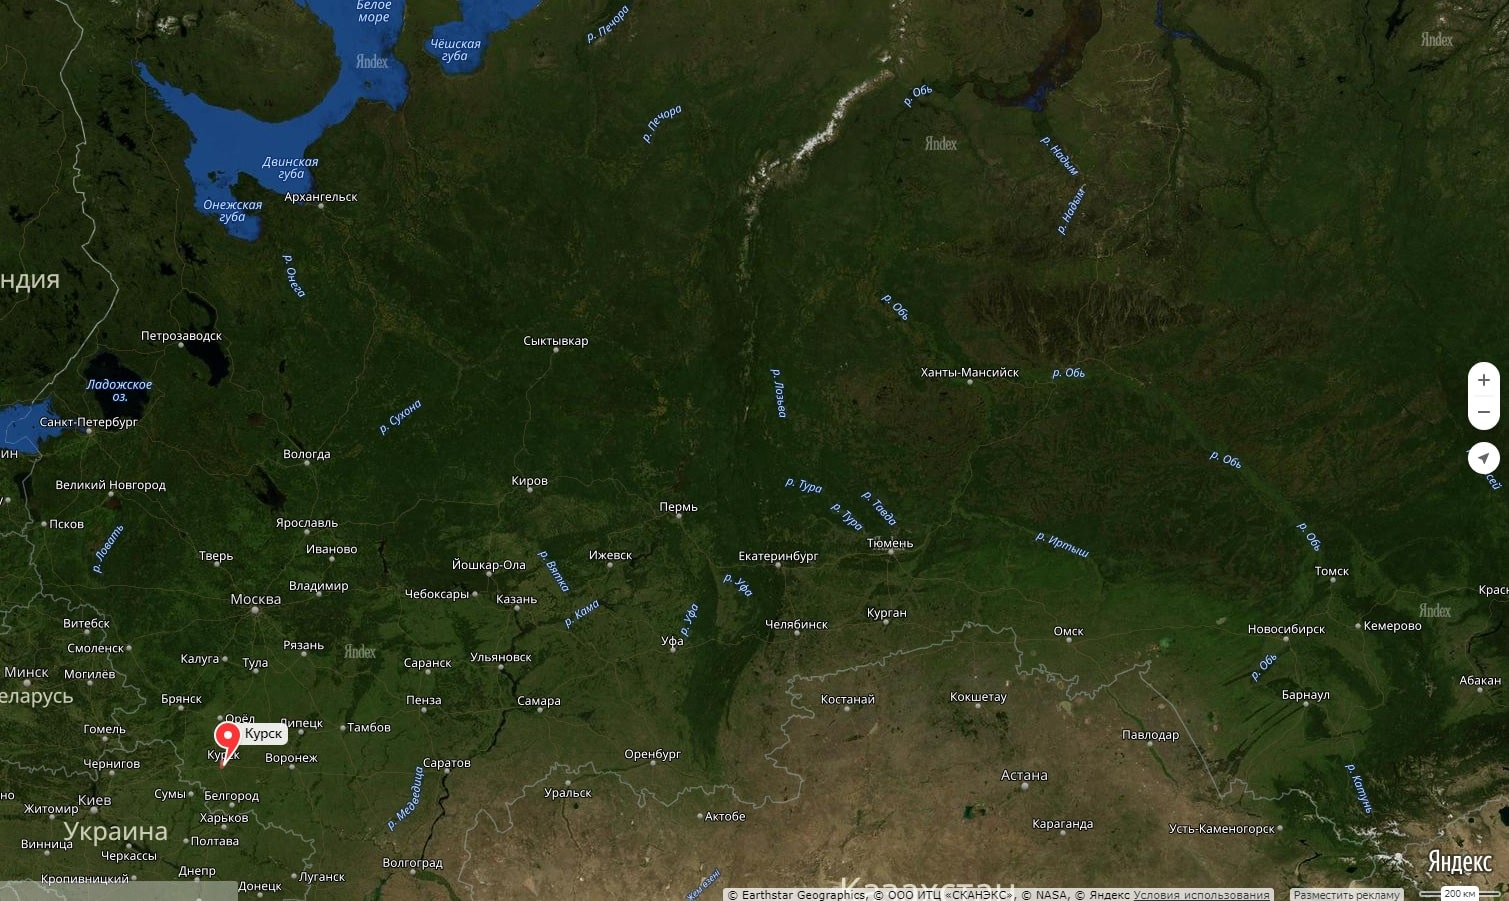 гугл карта вид со спутника панорамы улиц